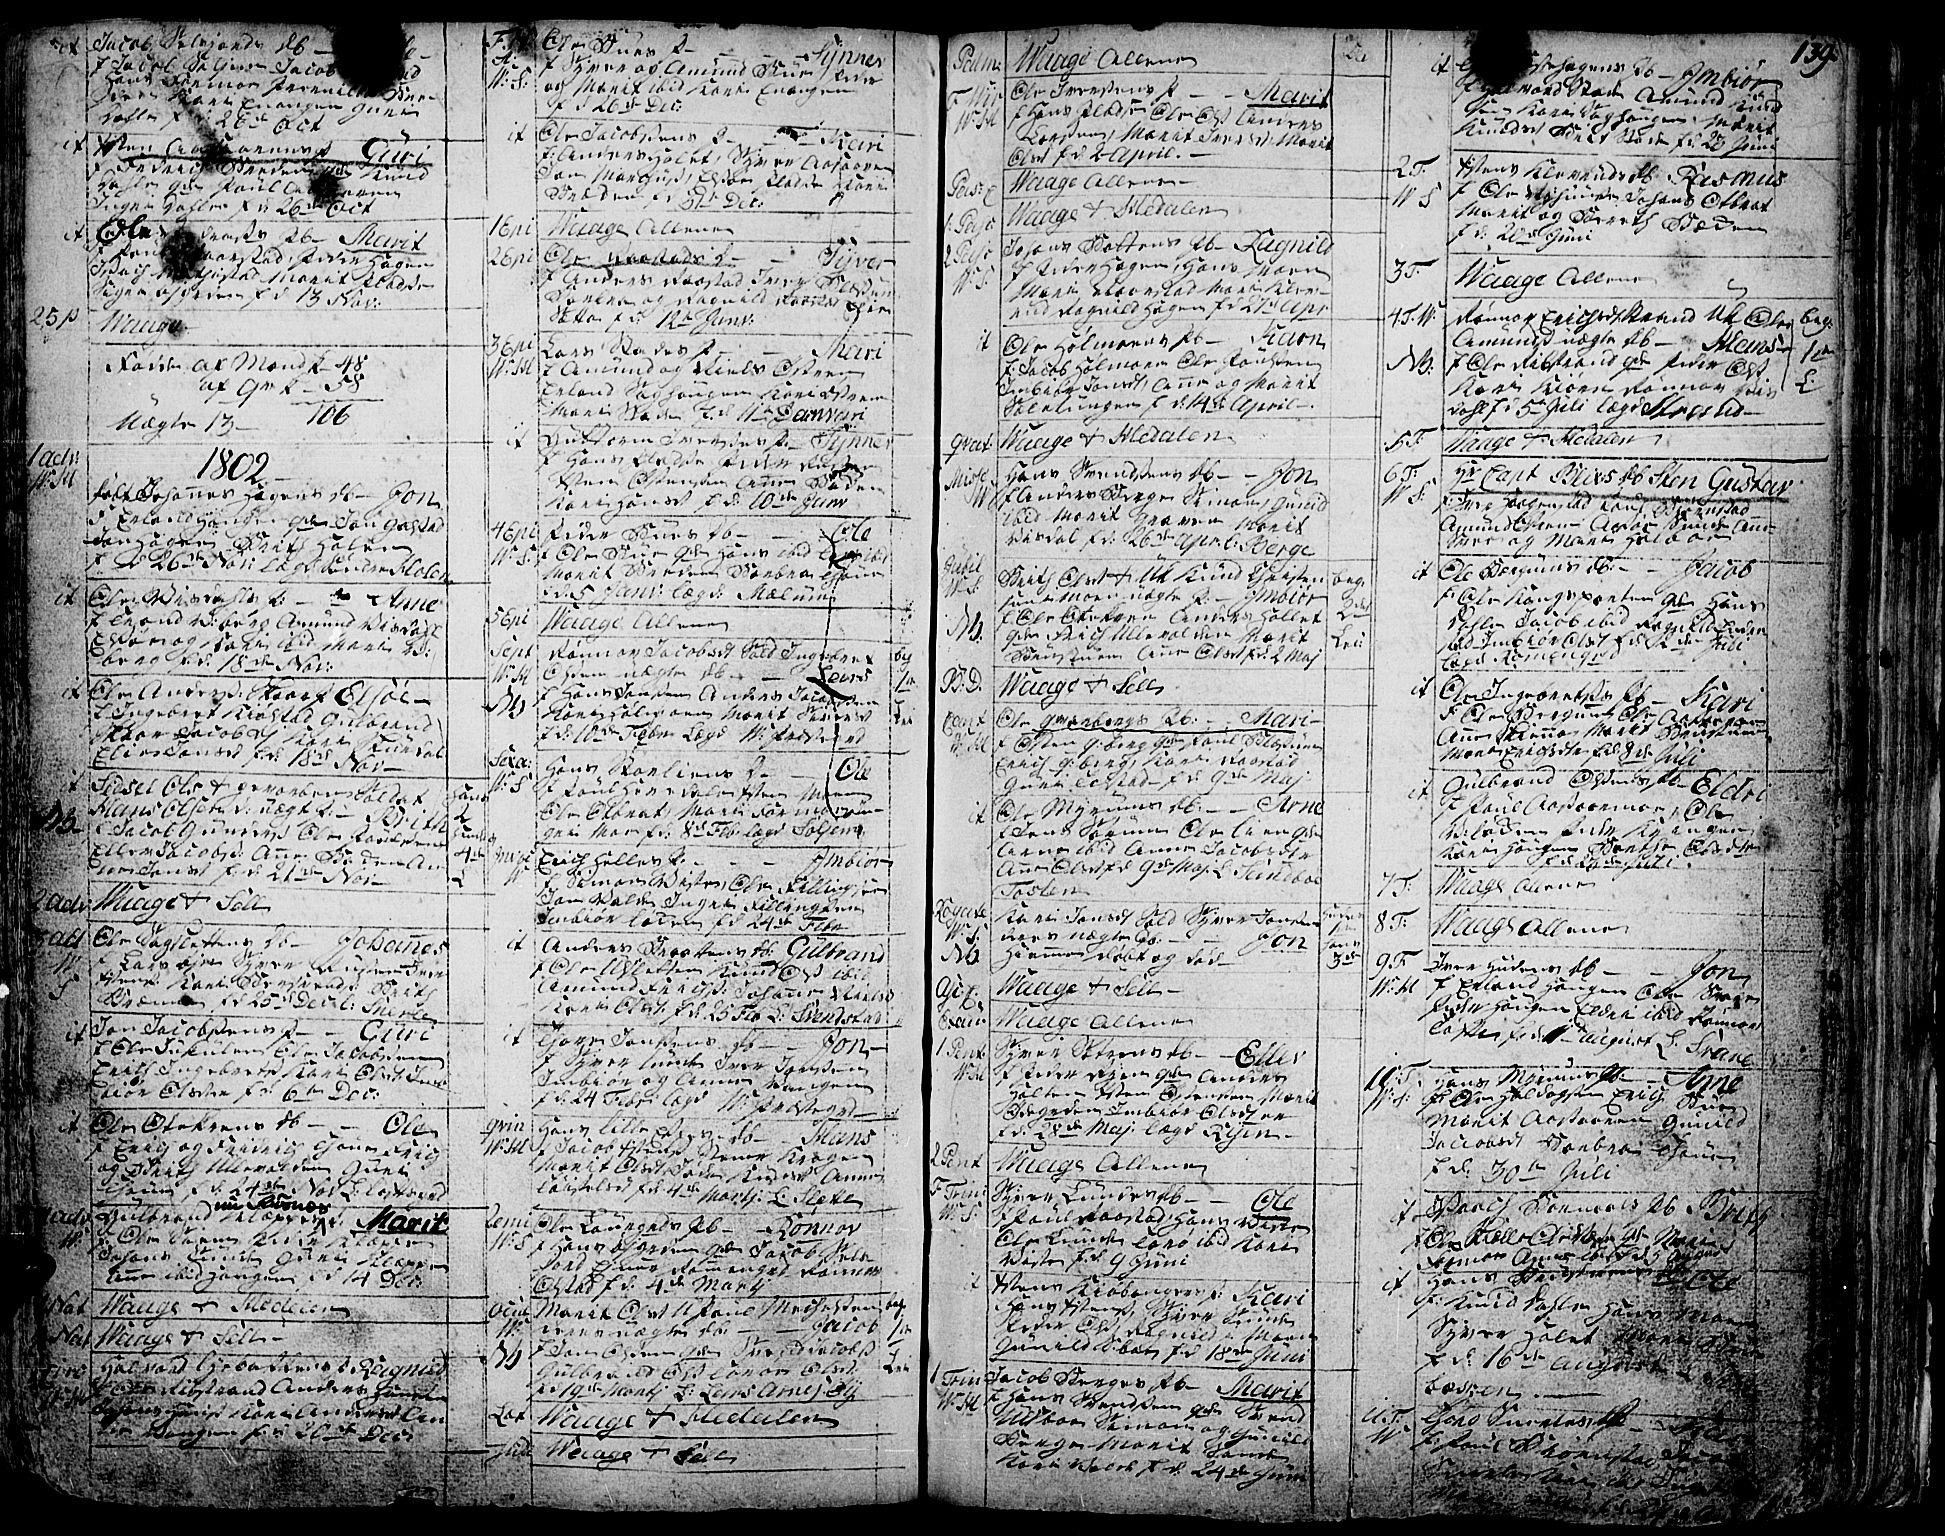 SAH, Vågå prestekontor, Ministerialbok nr. 1, 1739-1810, s. 139